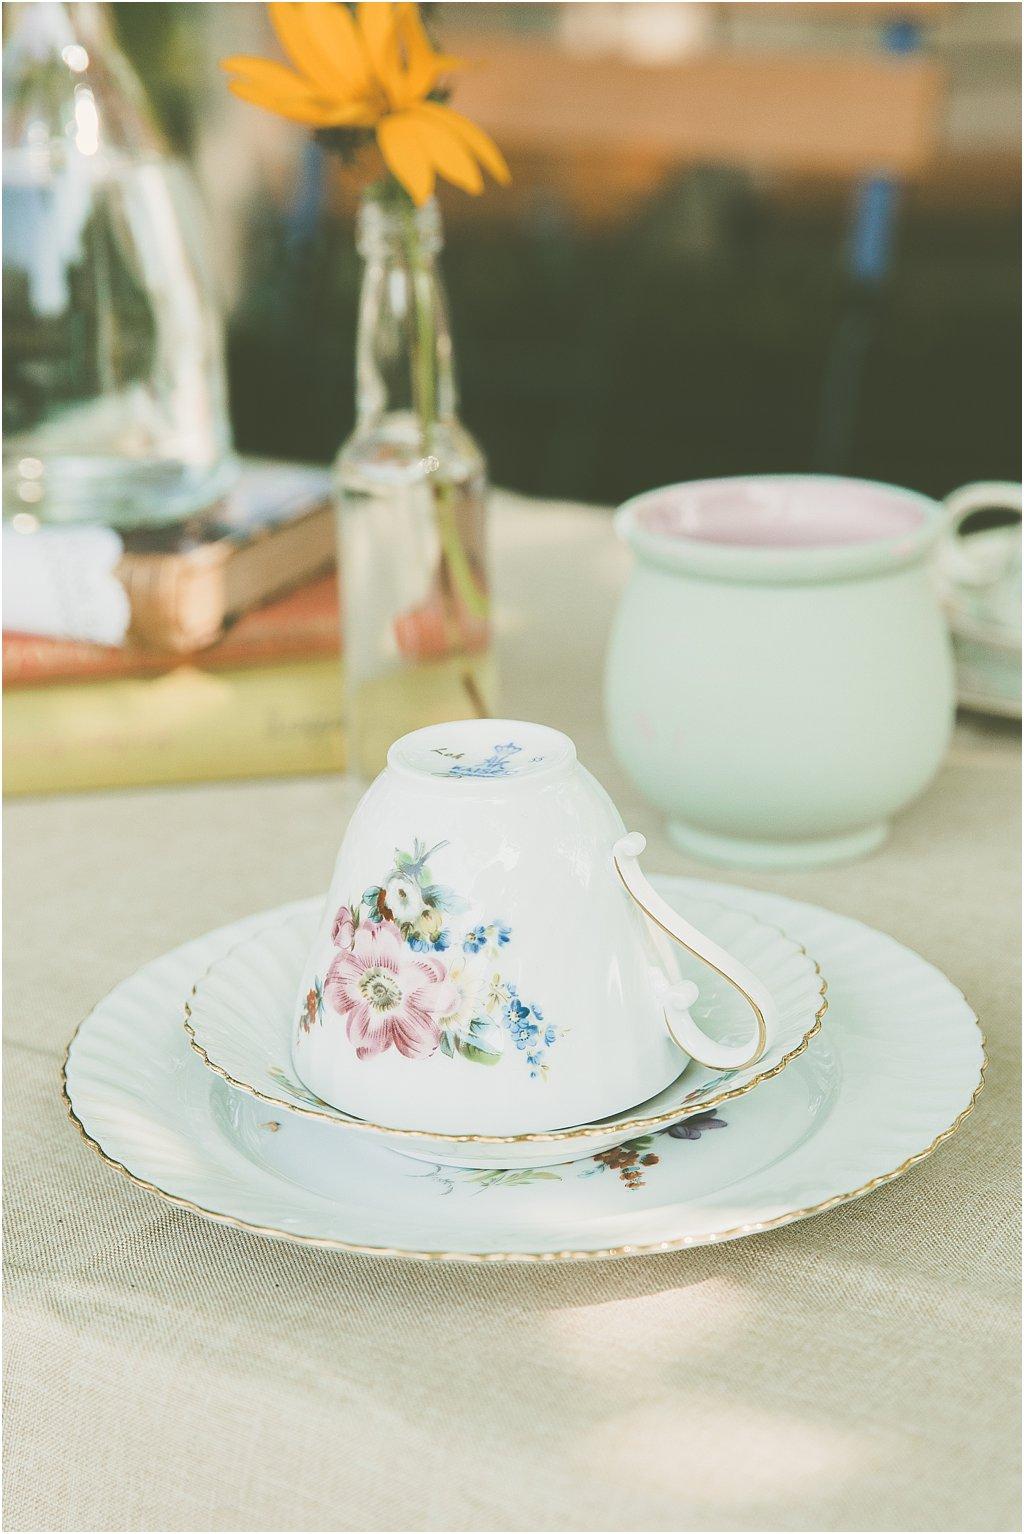 Kaffeetasse Vintage Porzellan